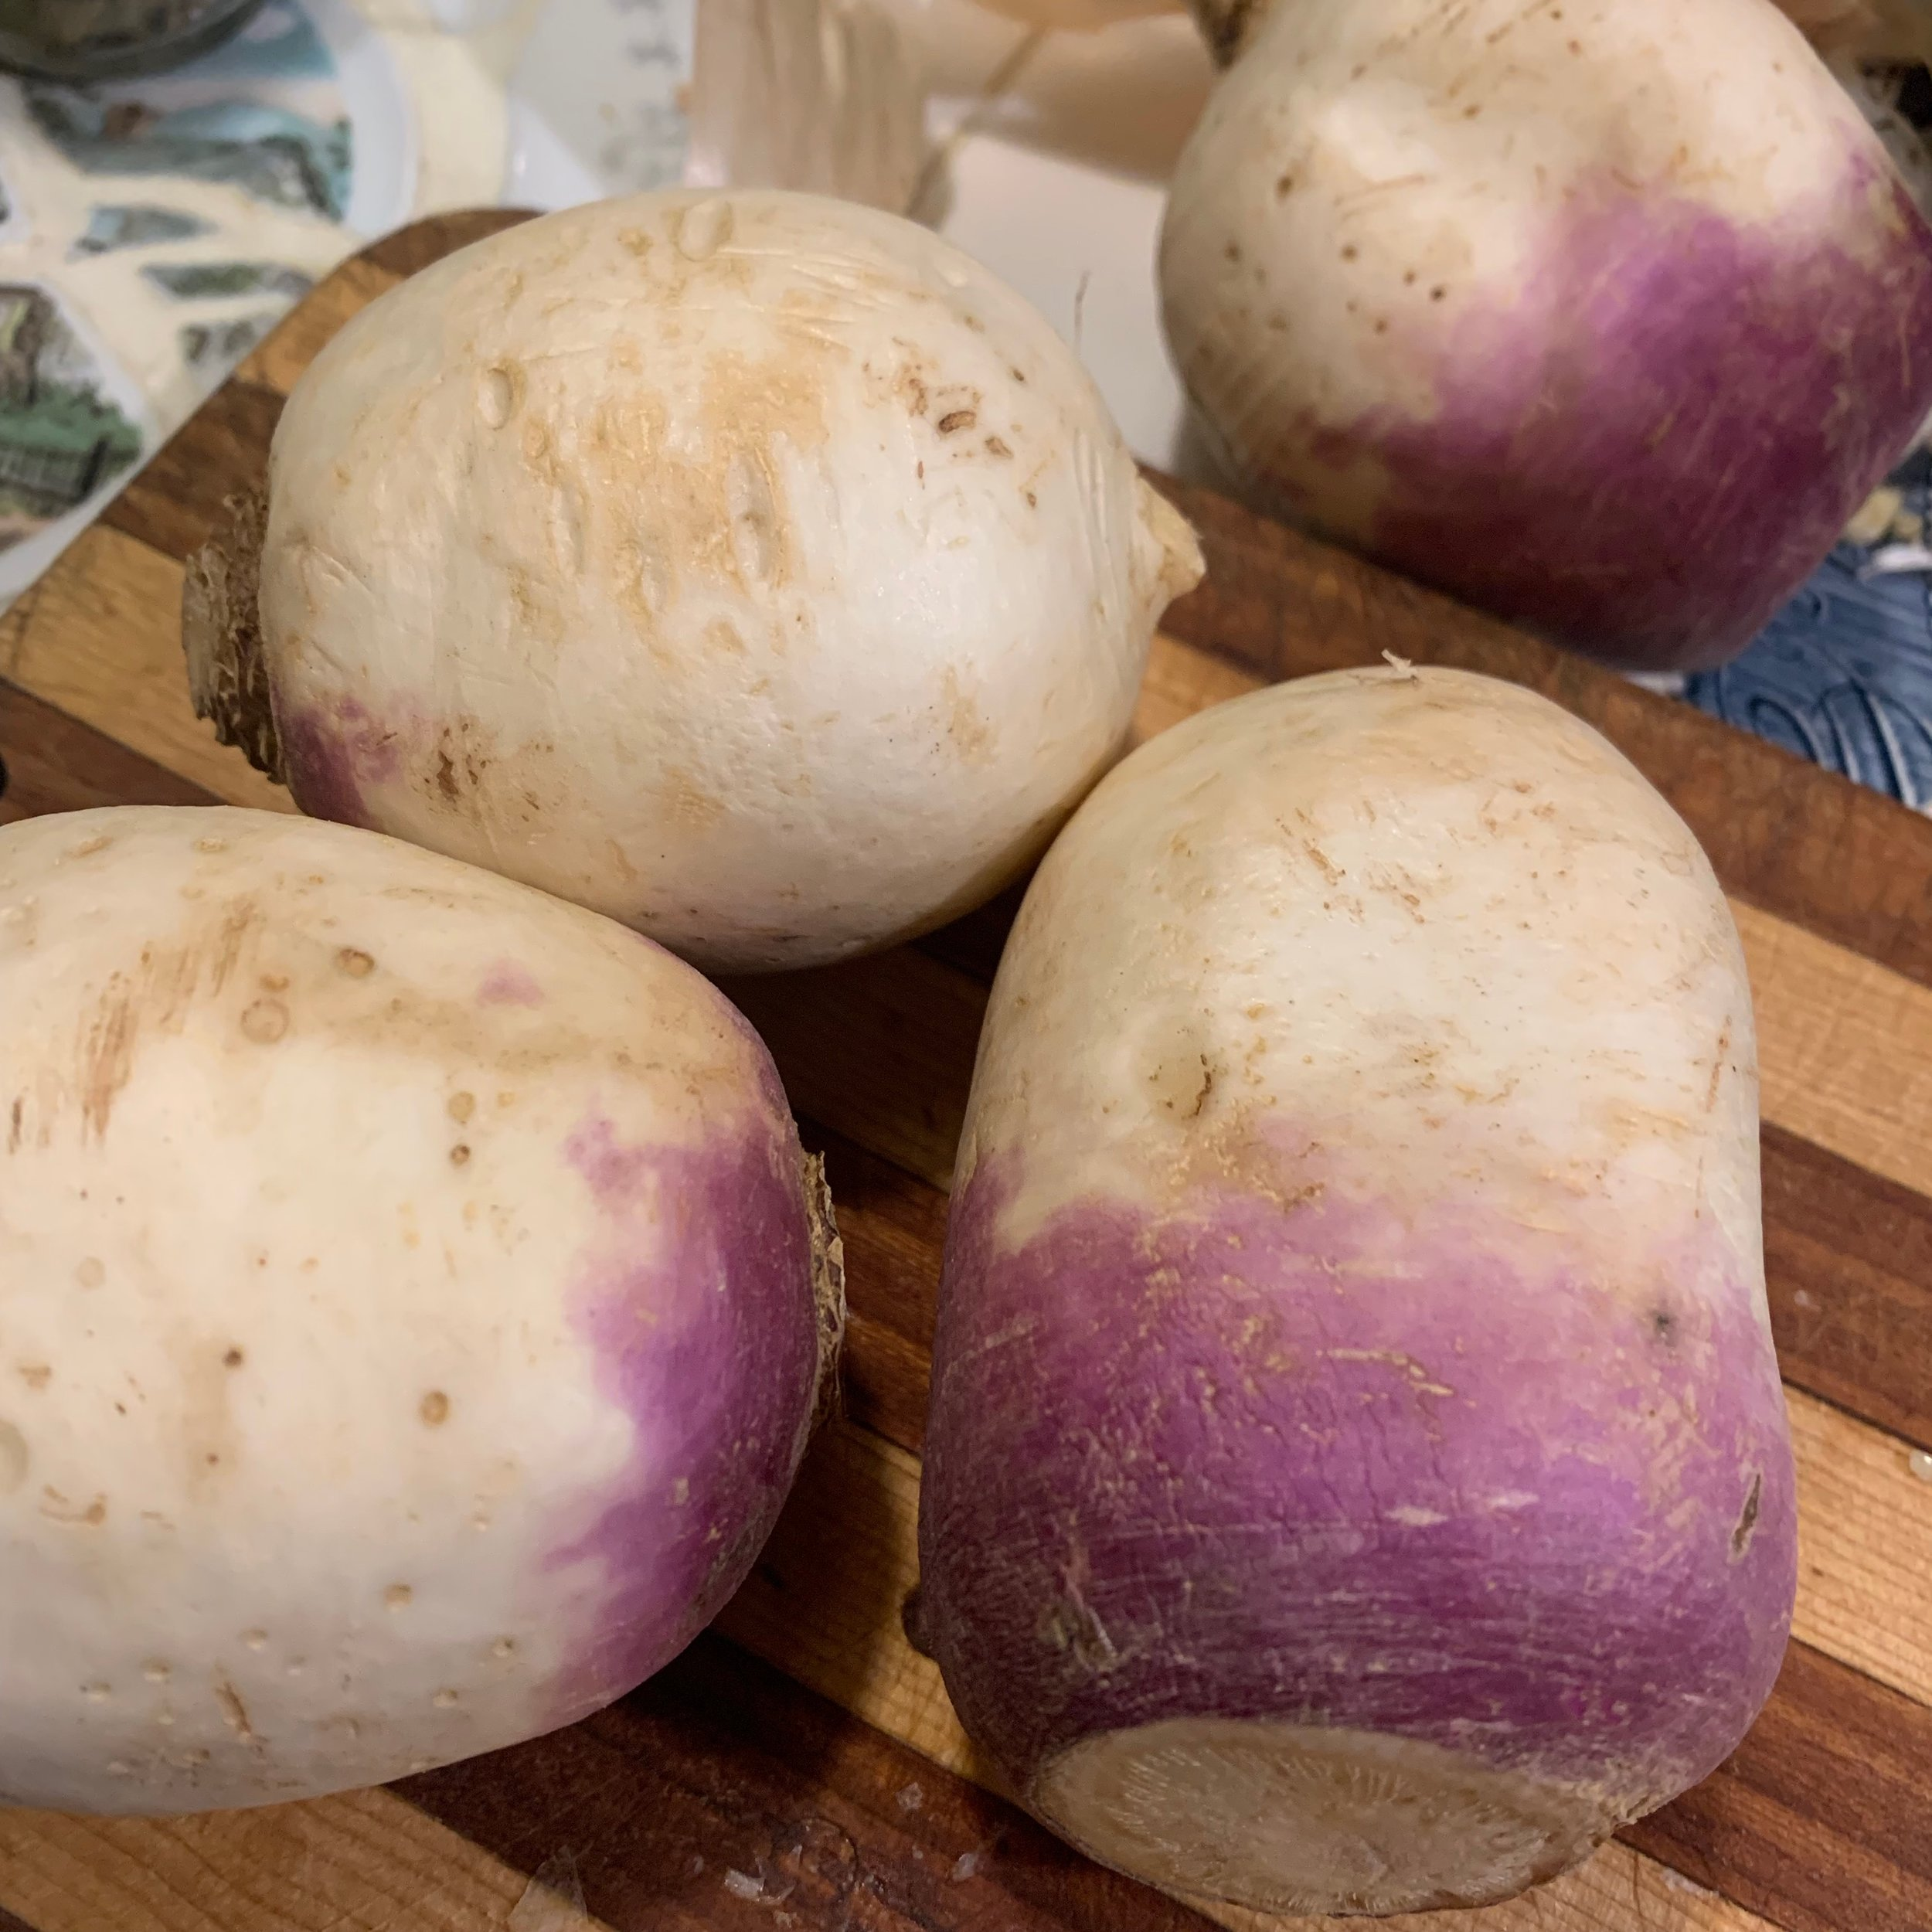 turnips are a fun white ingredient, lighter in taste than potato